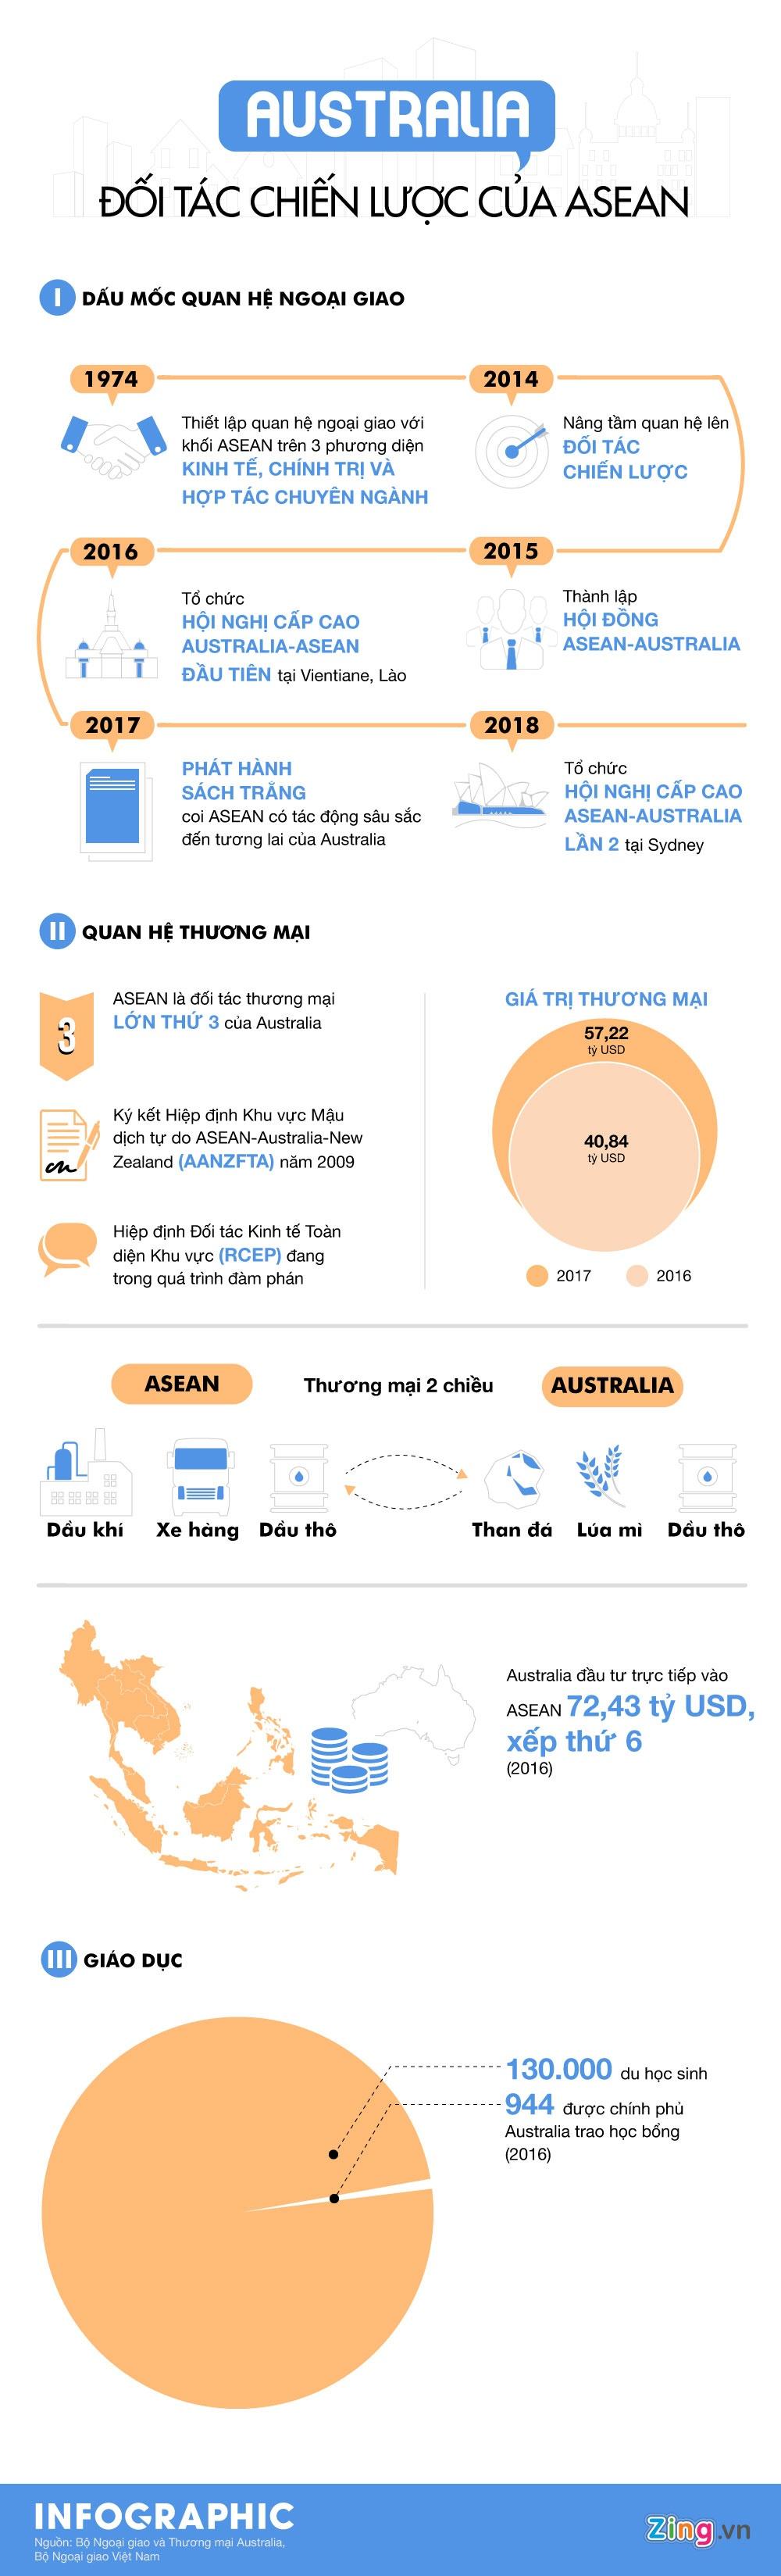 Australia: Nguoi ban dau tien cua ASEAN hinh anh 1